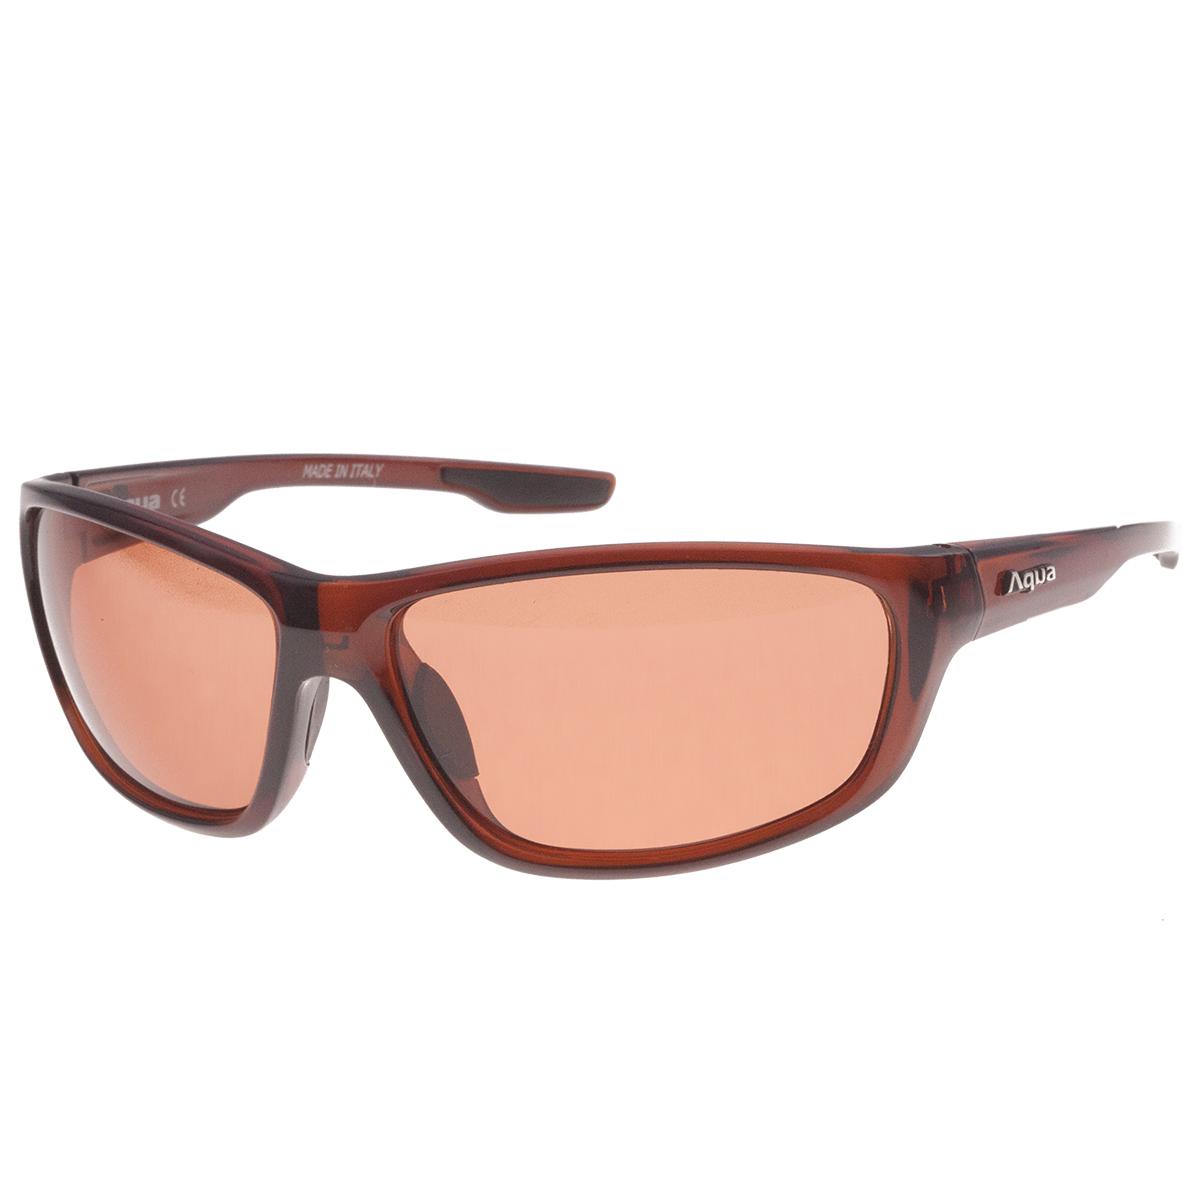 Best type of polarized sunglasses for fishing louisiana for Best fishing glasses